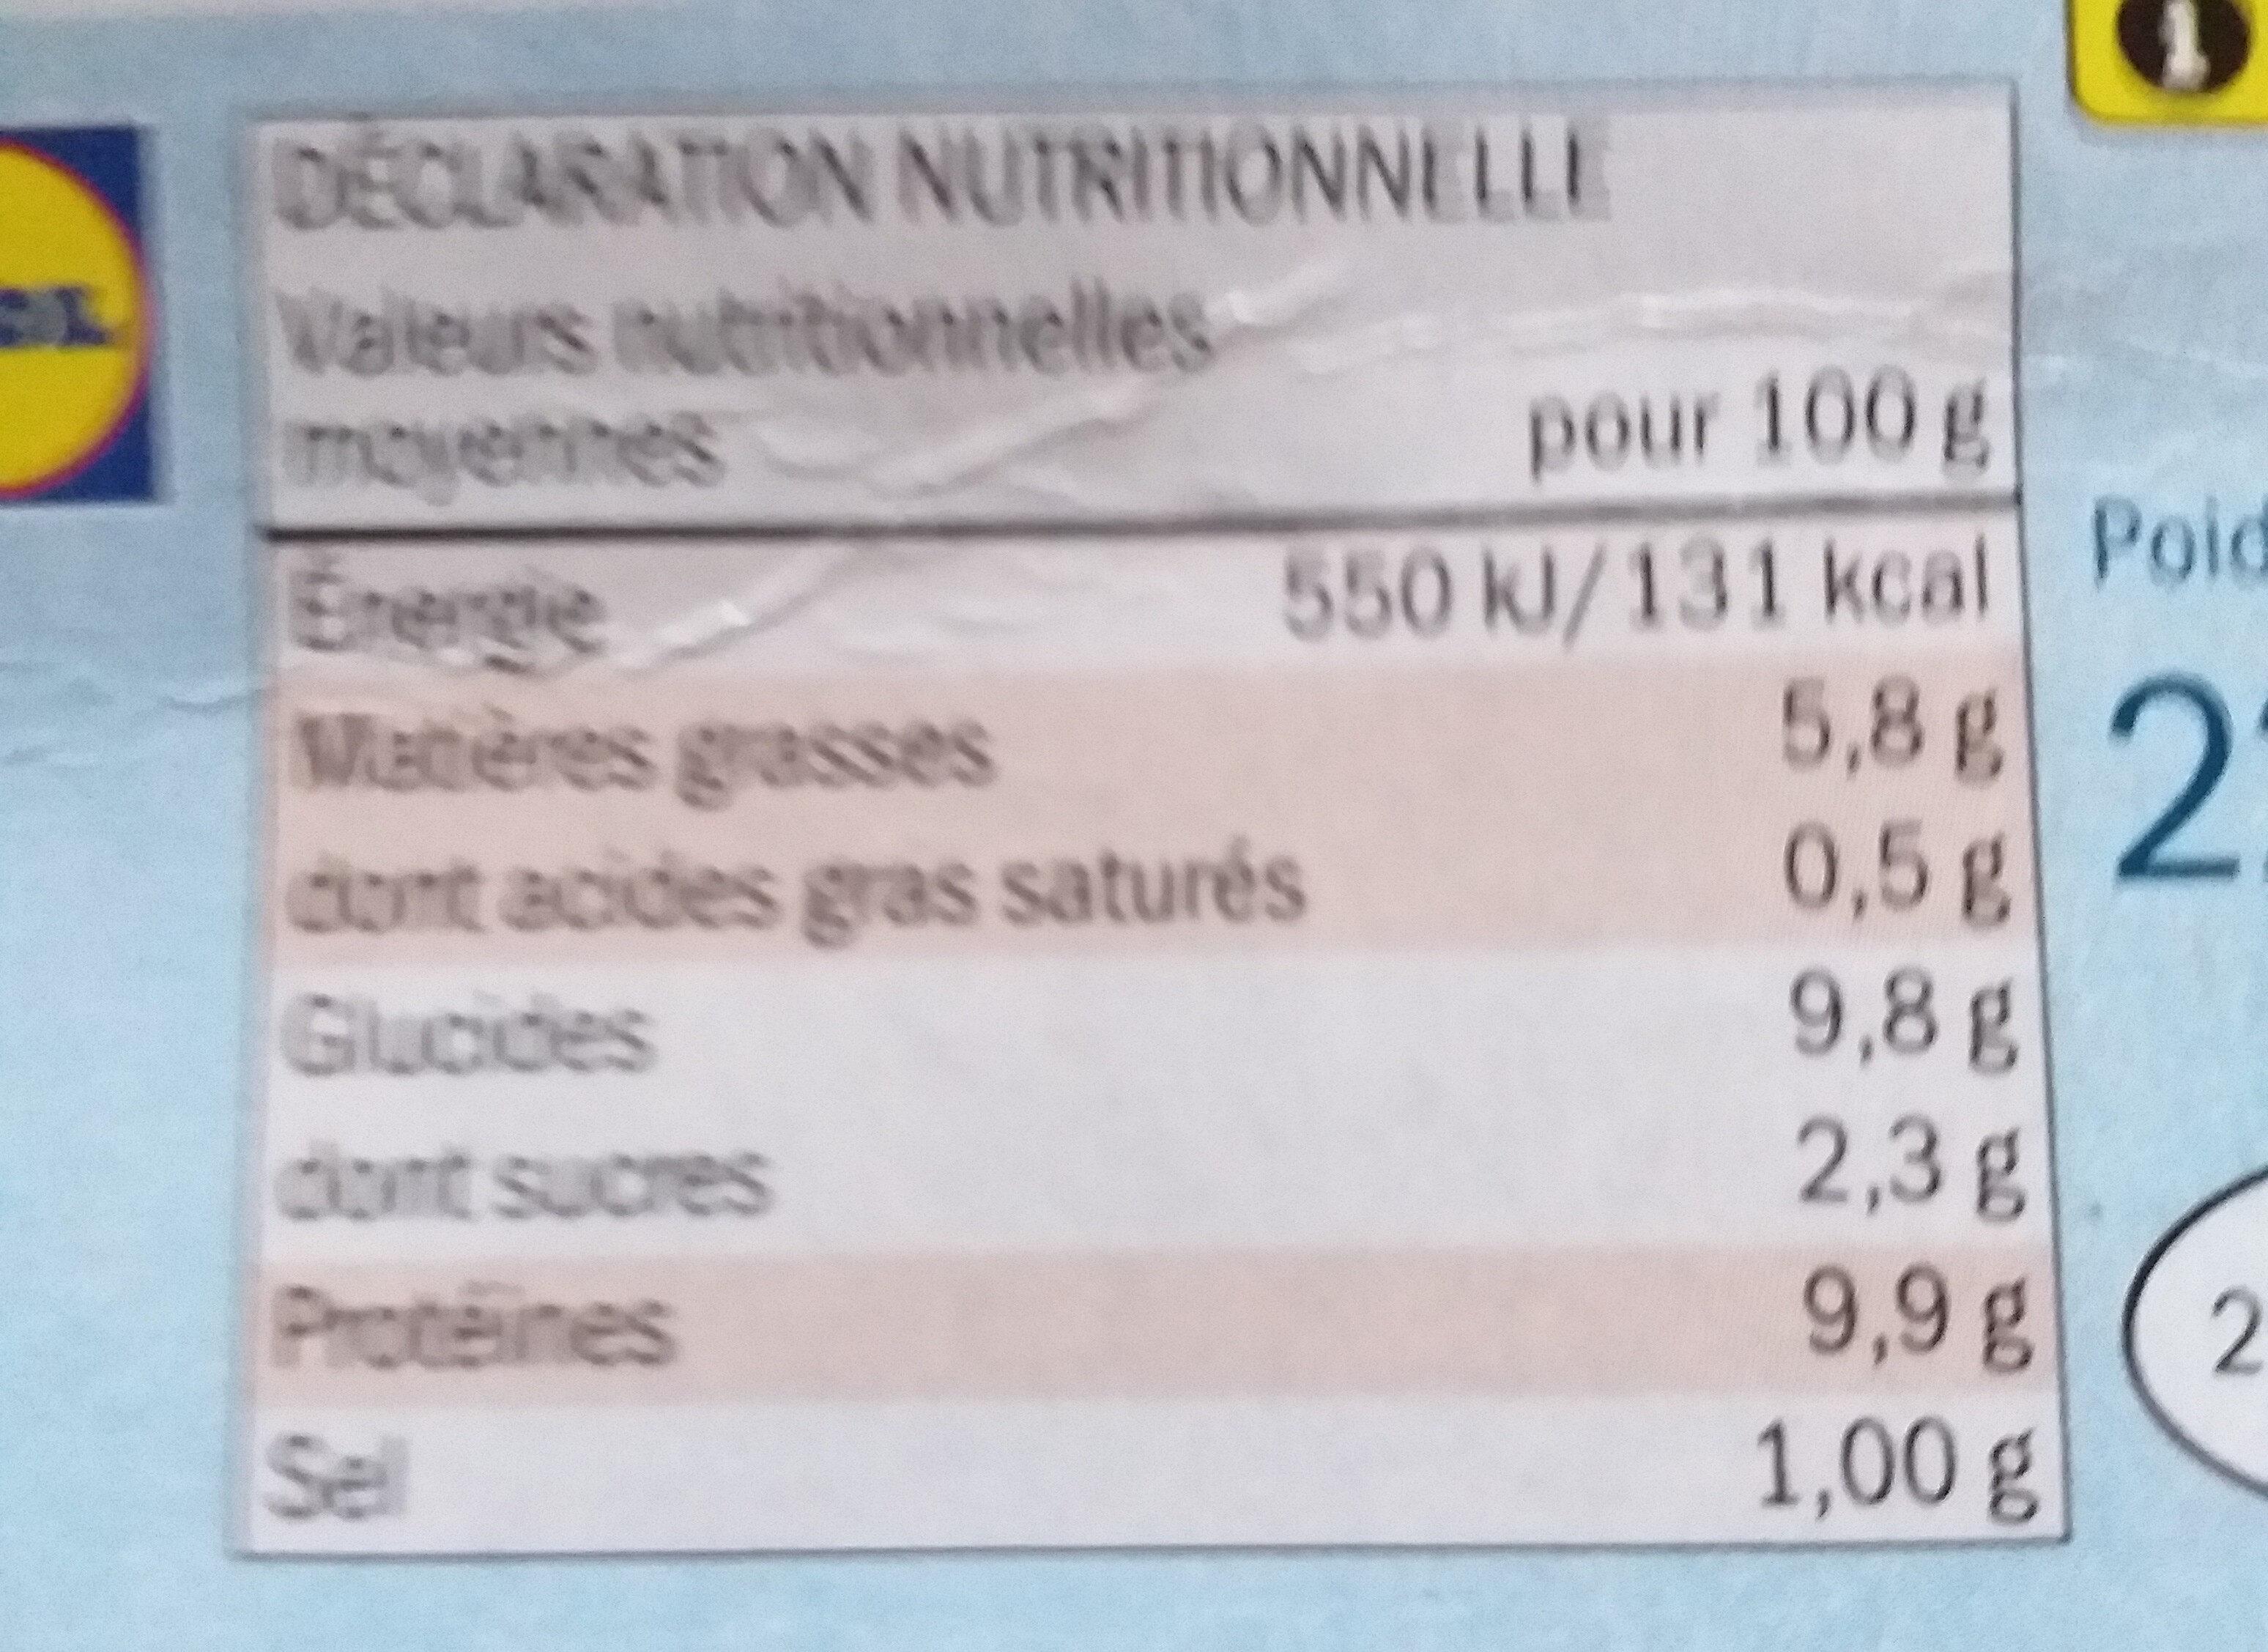 Salade Catalane au thon - Voedigswaarden